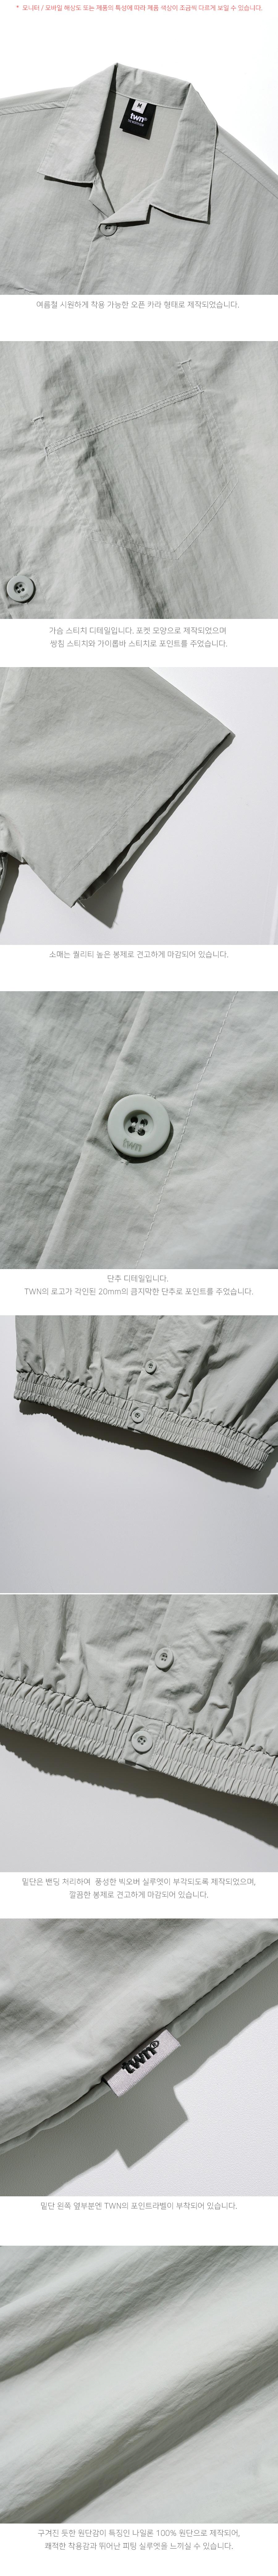 20200519_twn_stitchpocket_detail_gray_sh_02.jpg